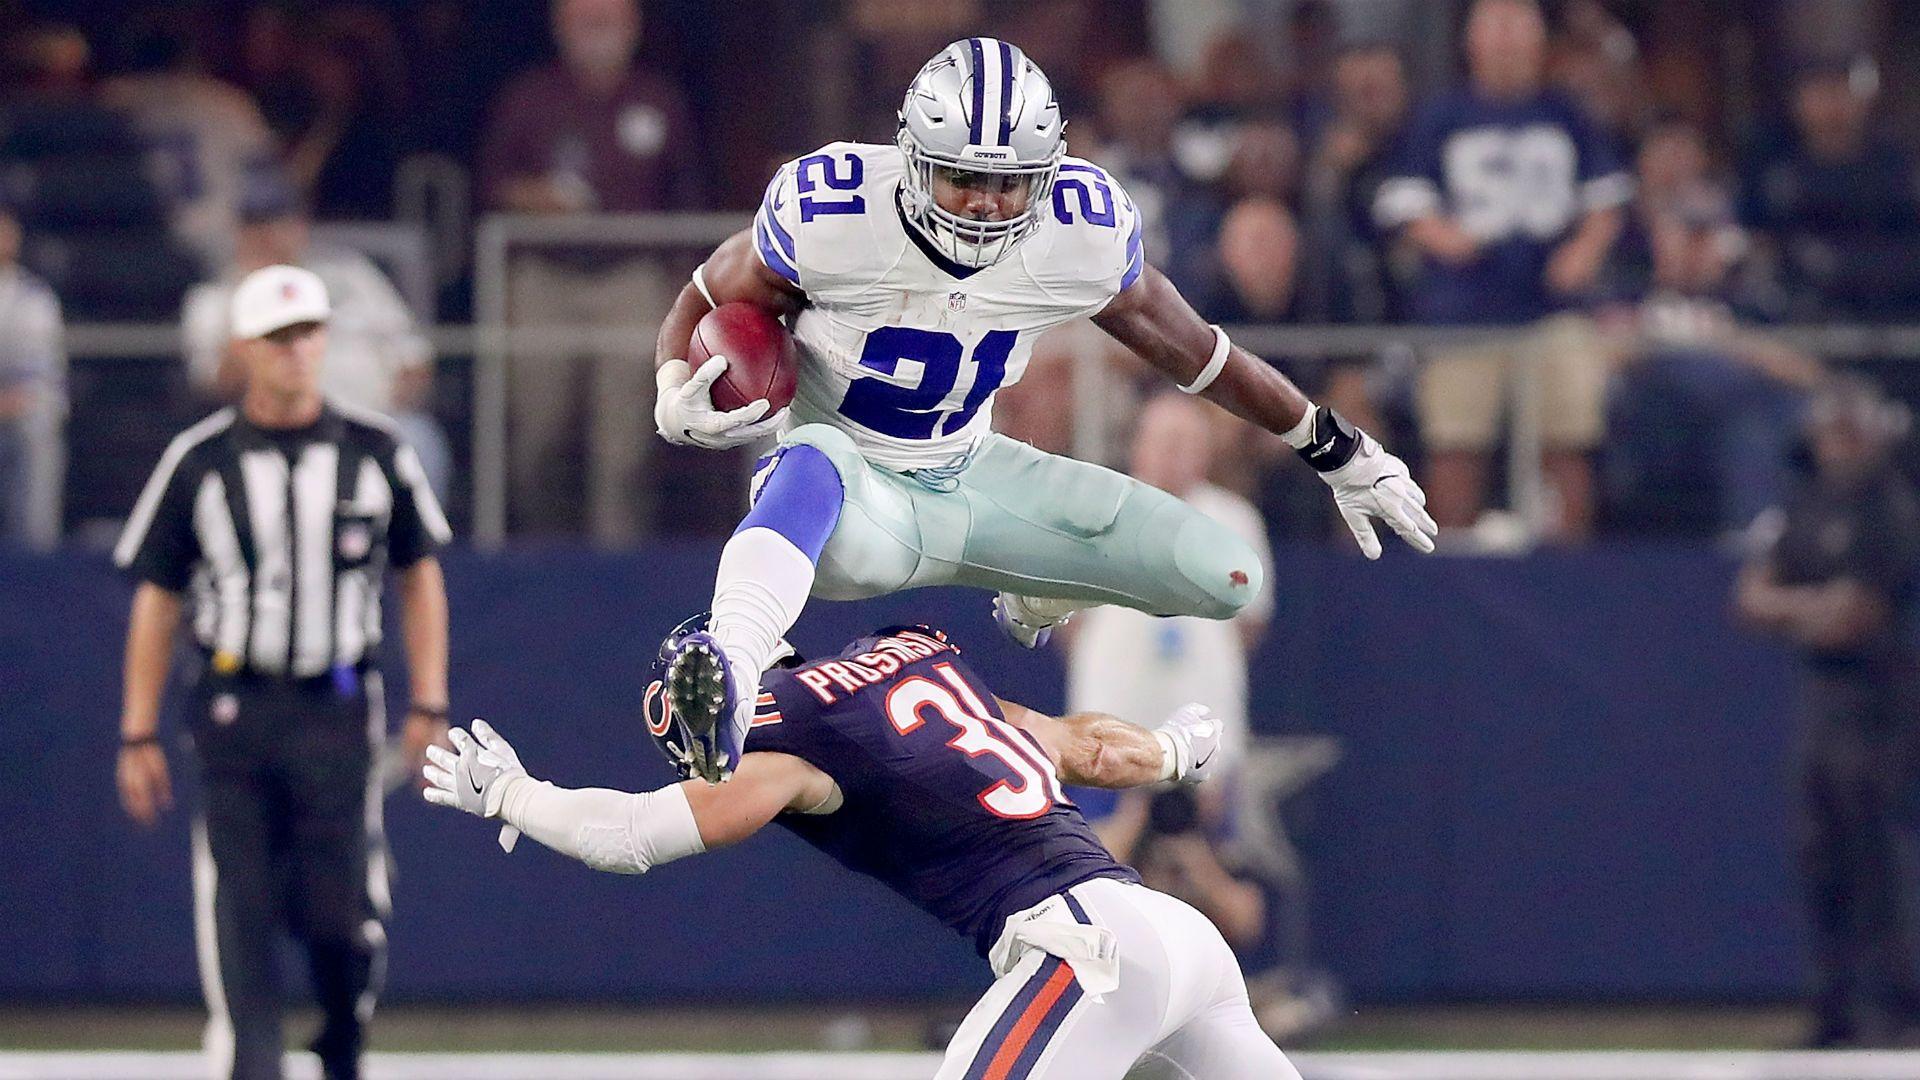 c5c9efb92 NFL feels Cowboys Dak Prescott and Ezekiel Elliott rookie duo power   MovieTVTechGeeks via  MovieTVTechGeeks